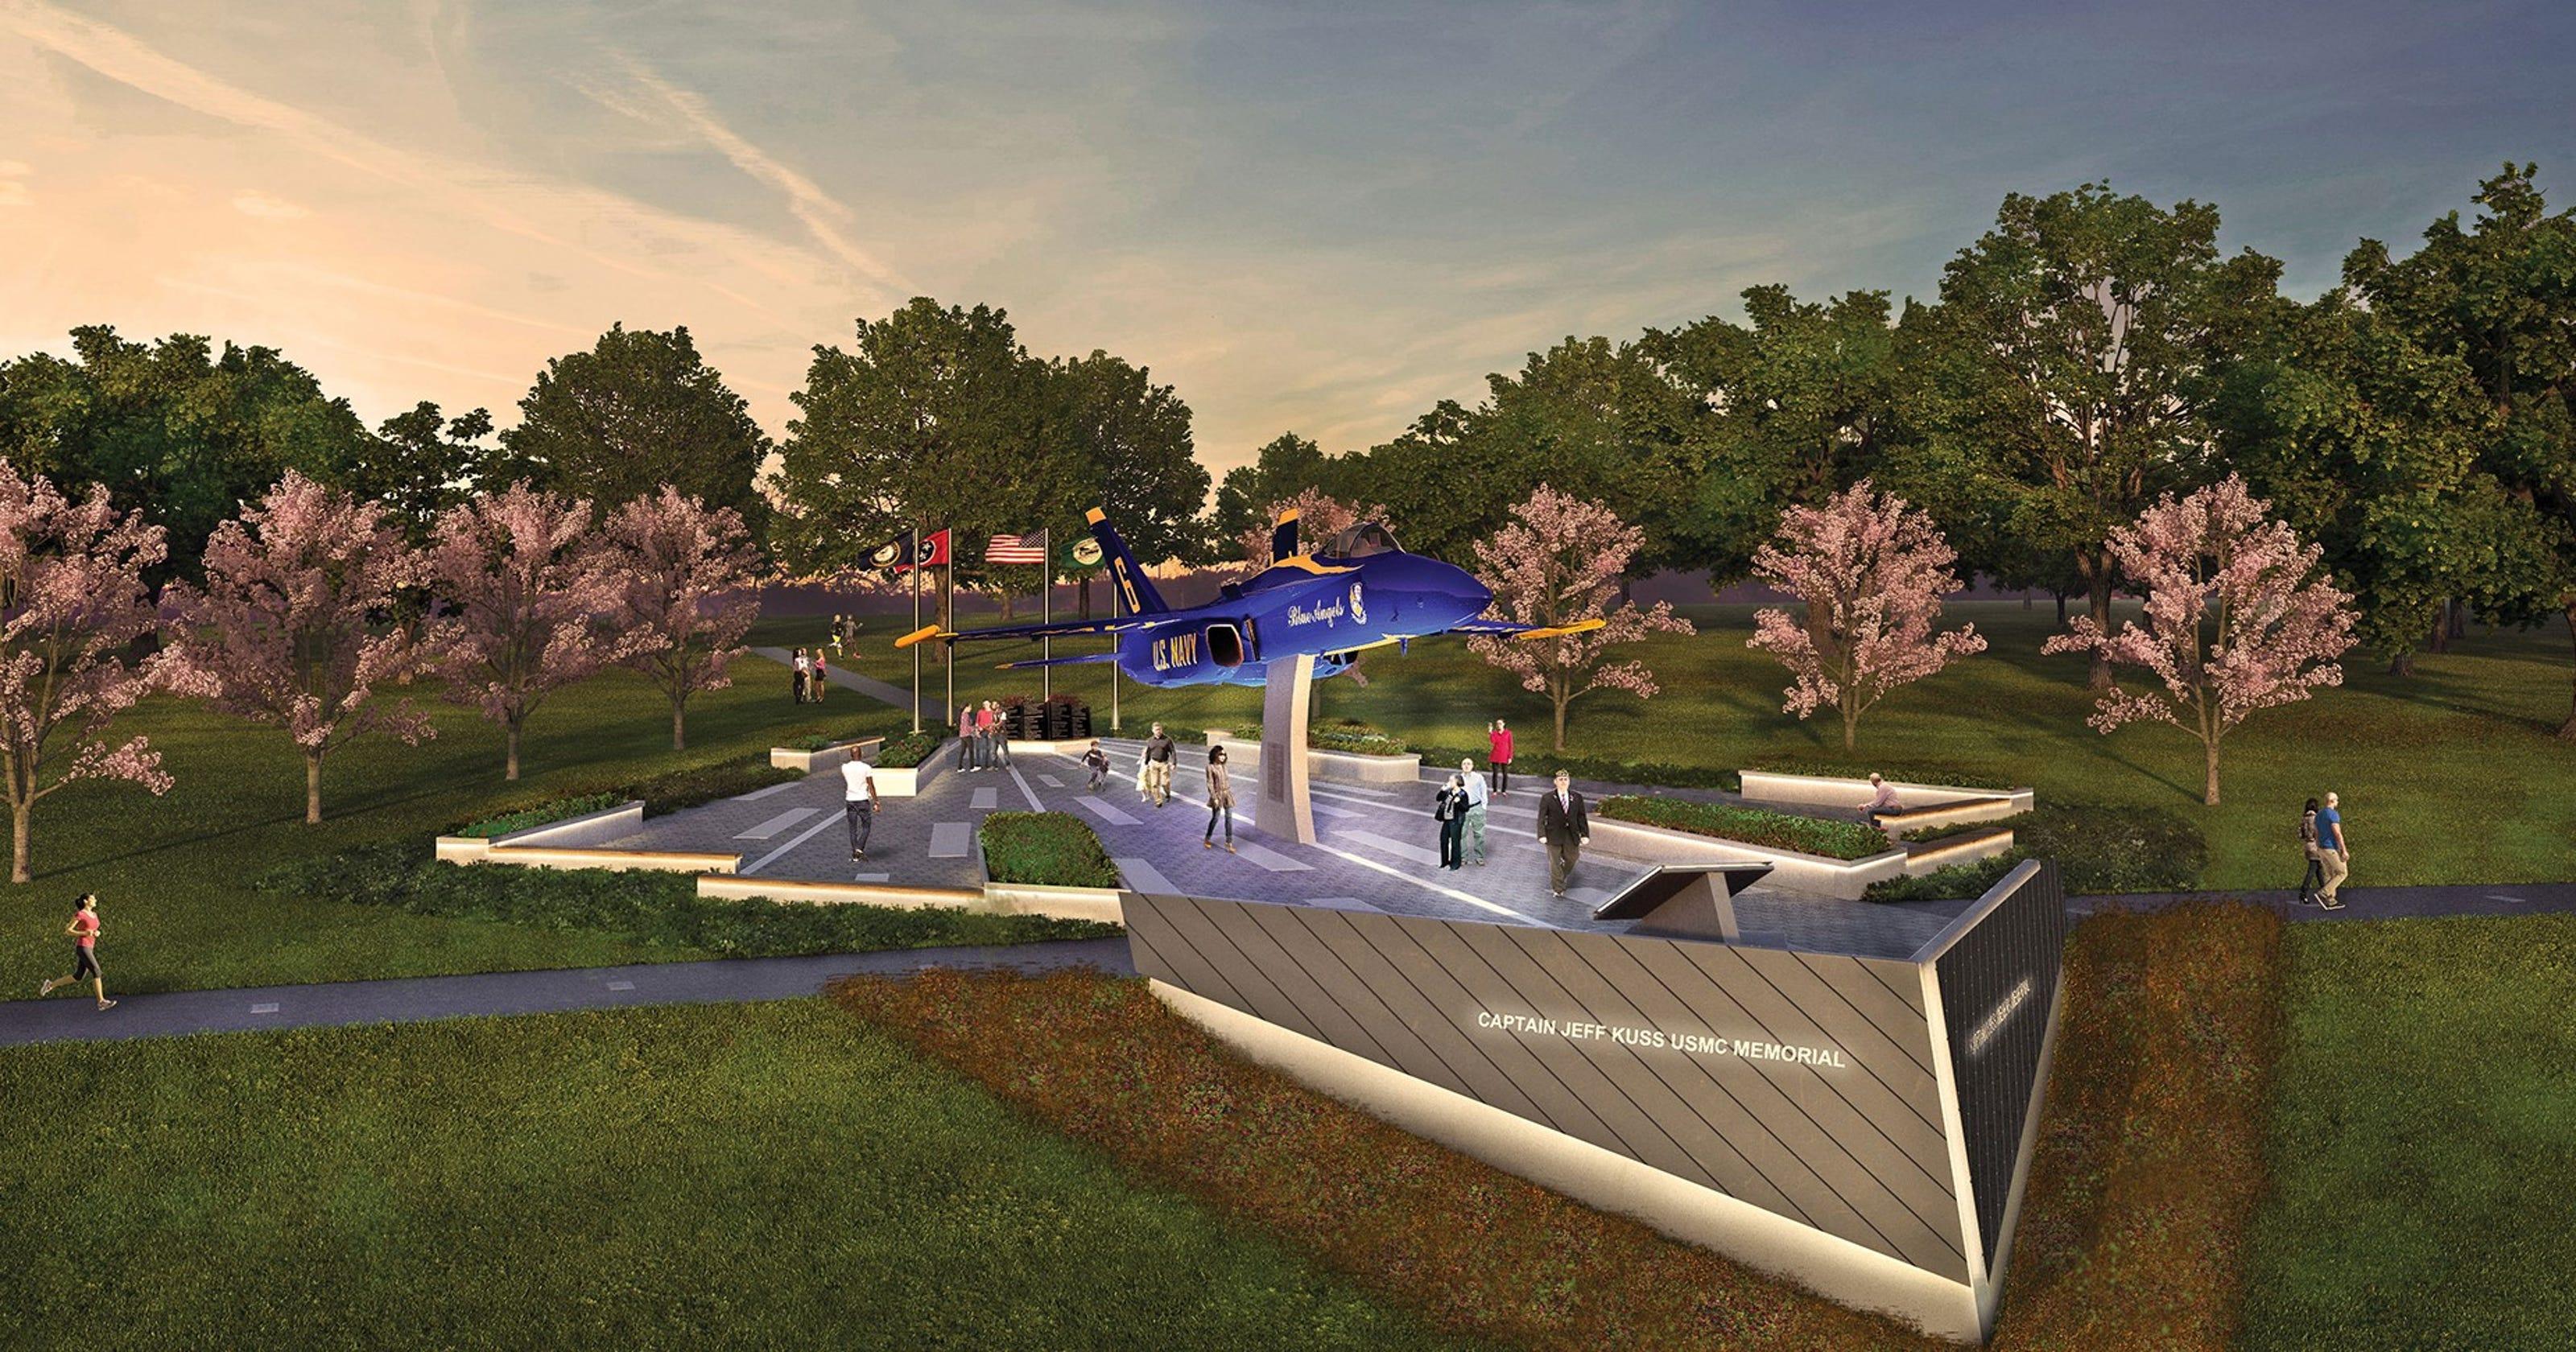 Blue Angels crash: Smyrna memorial to honor fallen pilot